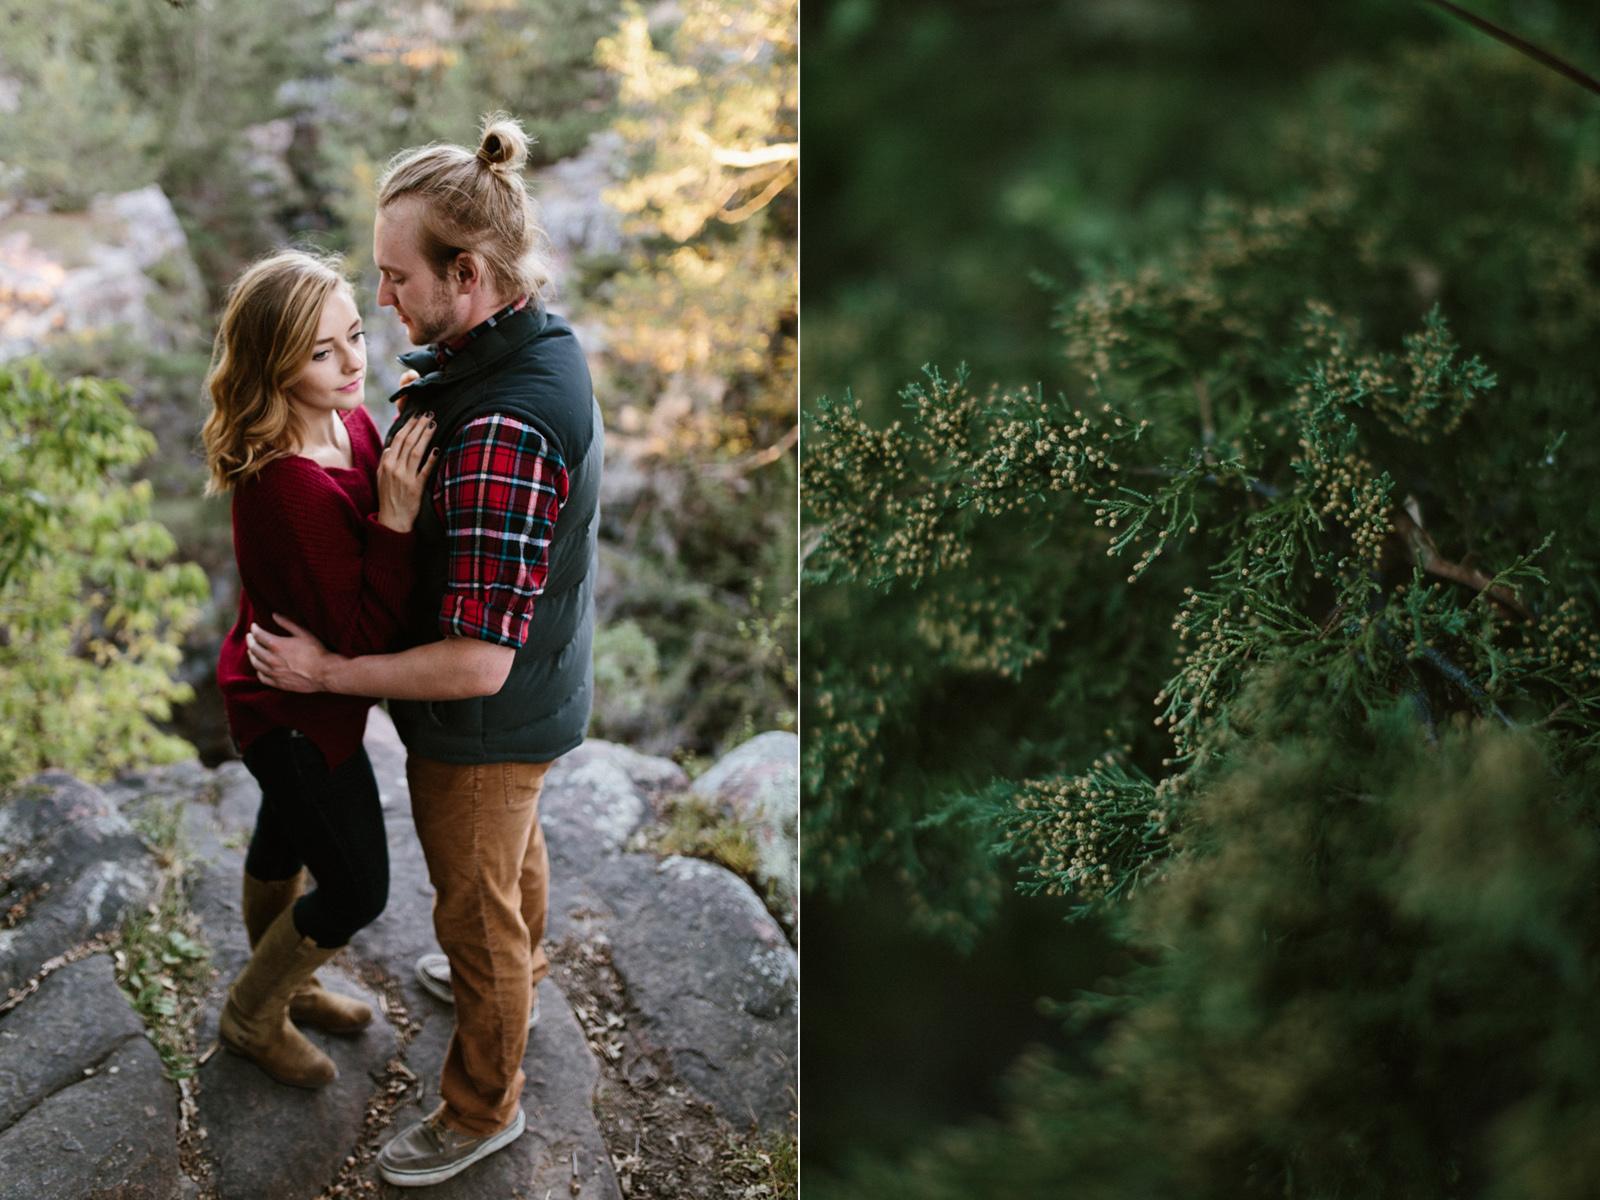 Sioux_Falls_Des_Moines_Engagement_Wedding_Photographer_31.jpg